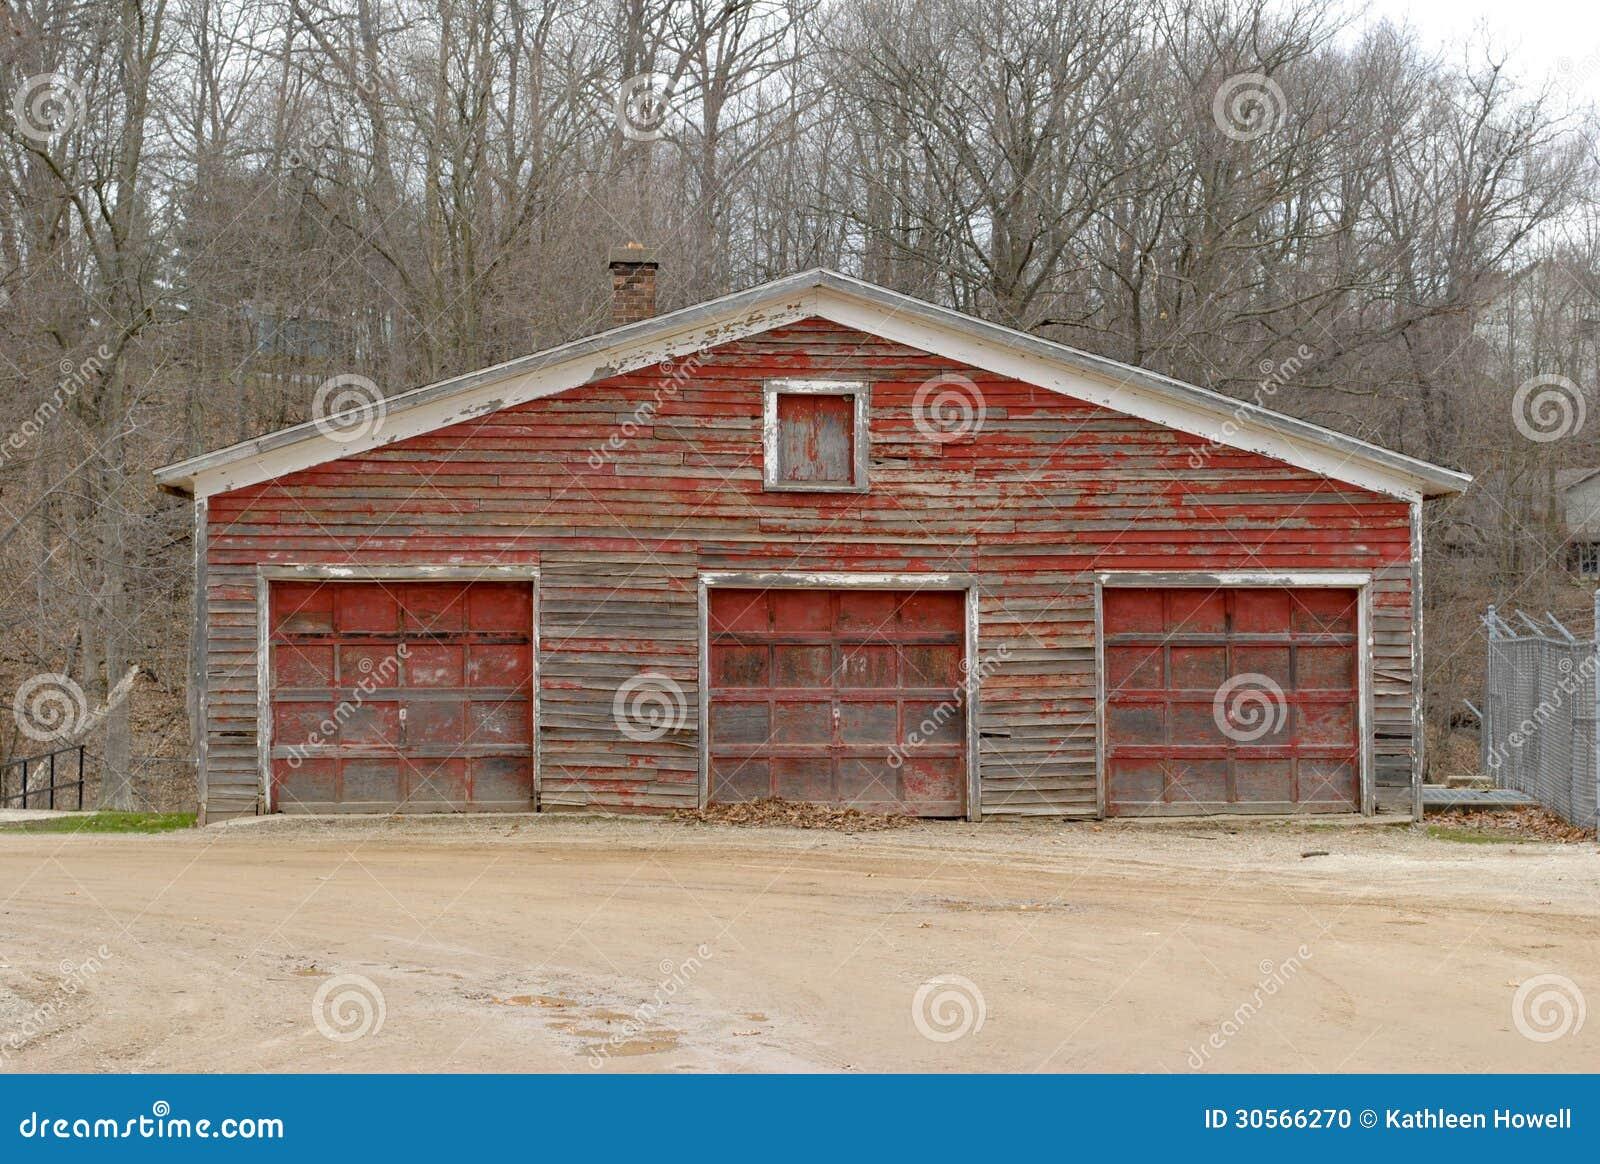 Old Garage Stock Photo Image 30566270